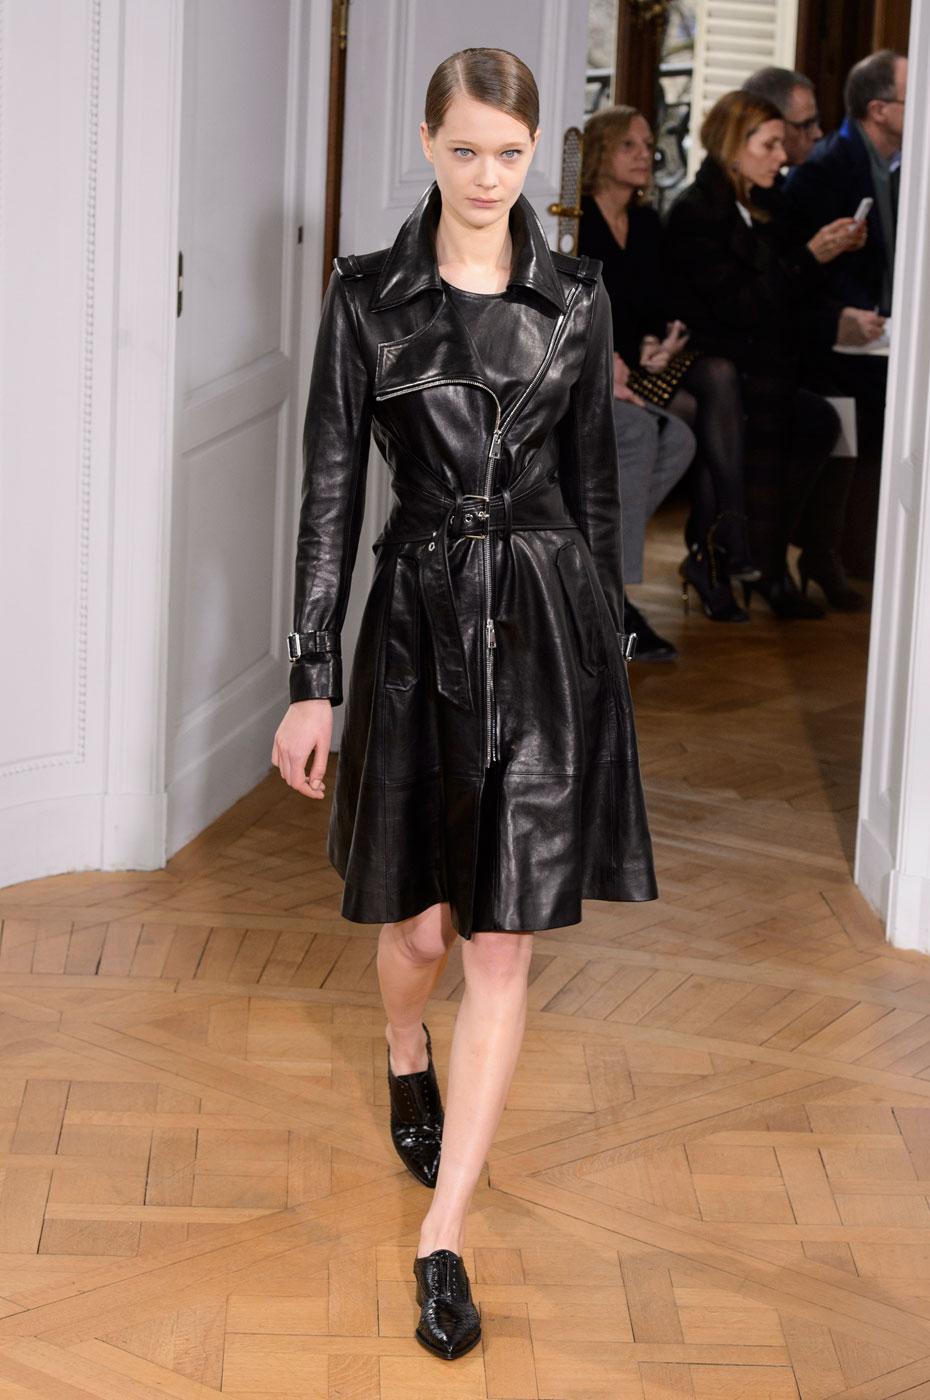 Bouchra-Jarrar-fashion-runway-show-haute-couture-paris-spring-summer-2015-the-impression-05